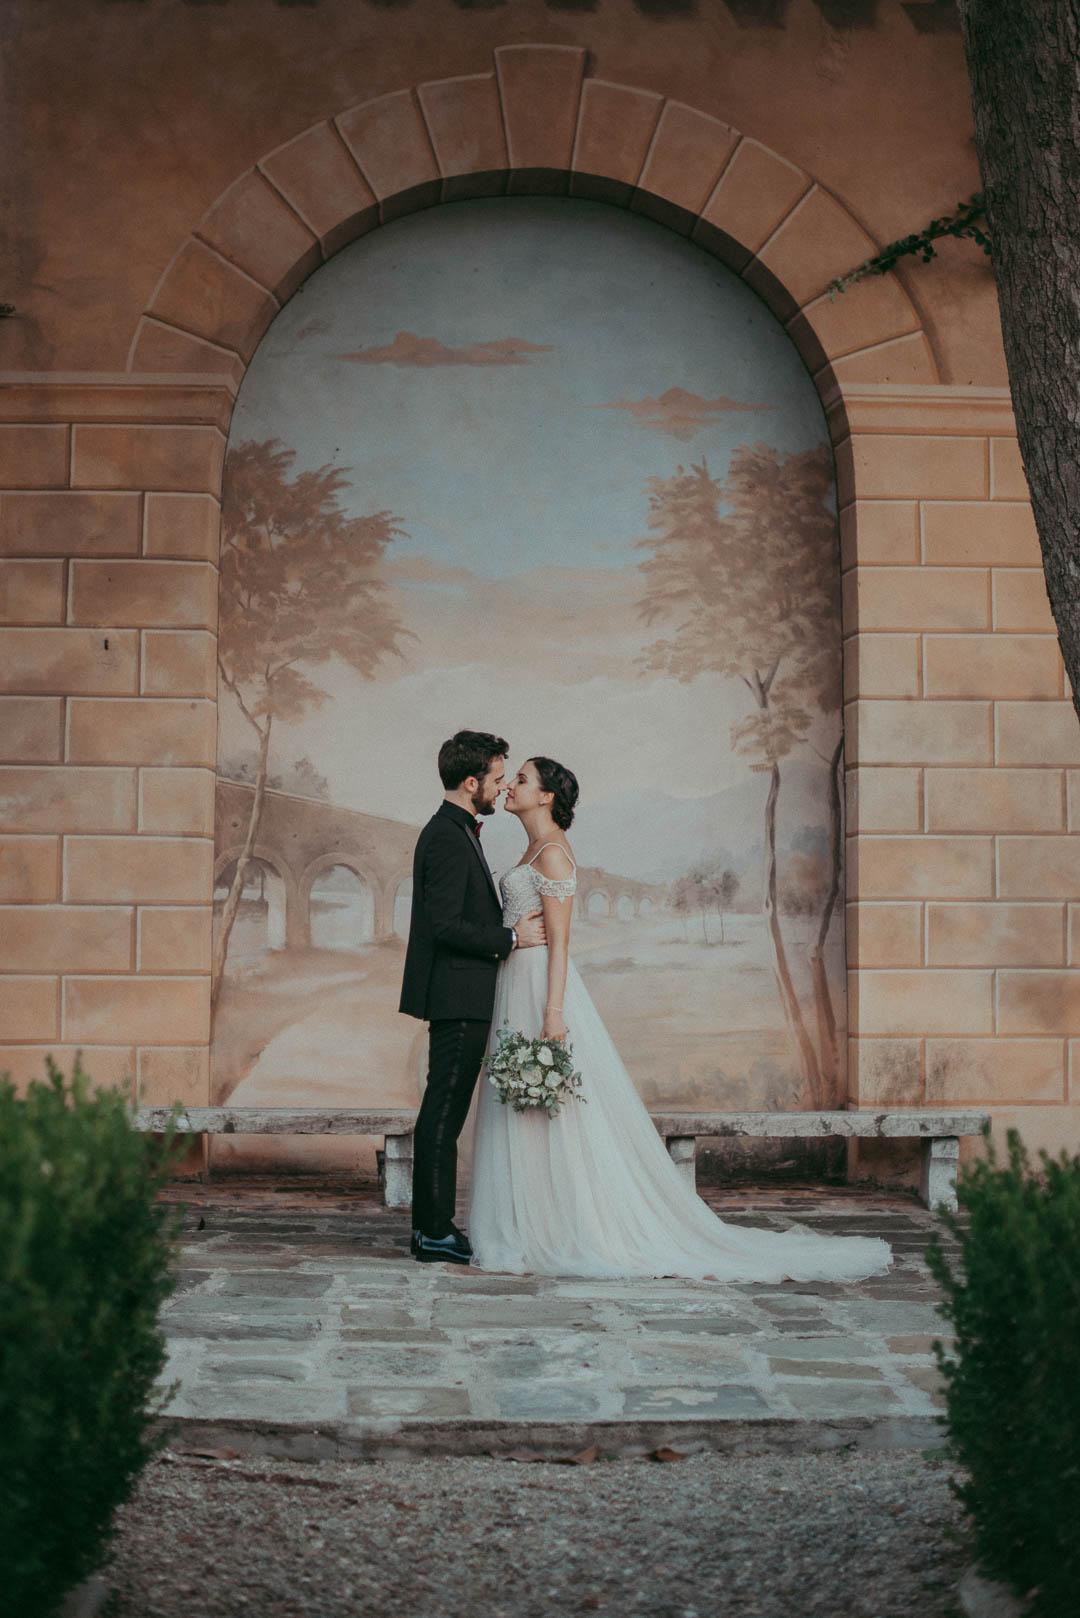 wedding-photographer-destination-fineart-bespoke-reportage-tuscany-villascorzi-vivianeizzo-spazio46-93